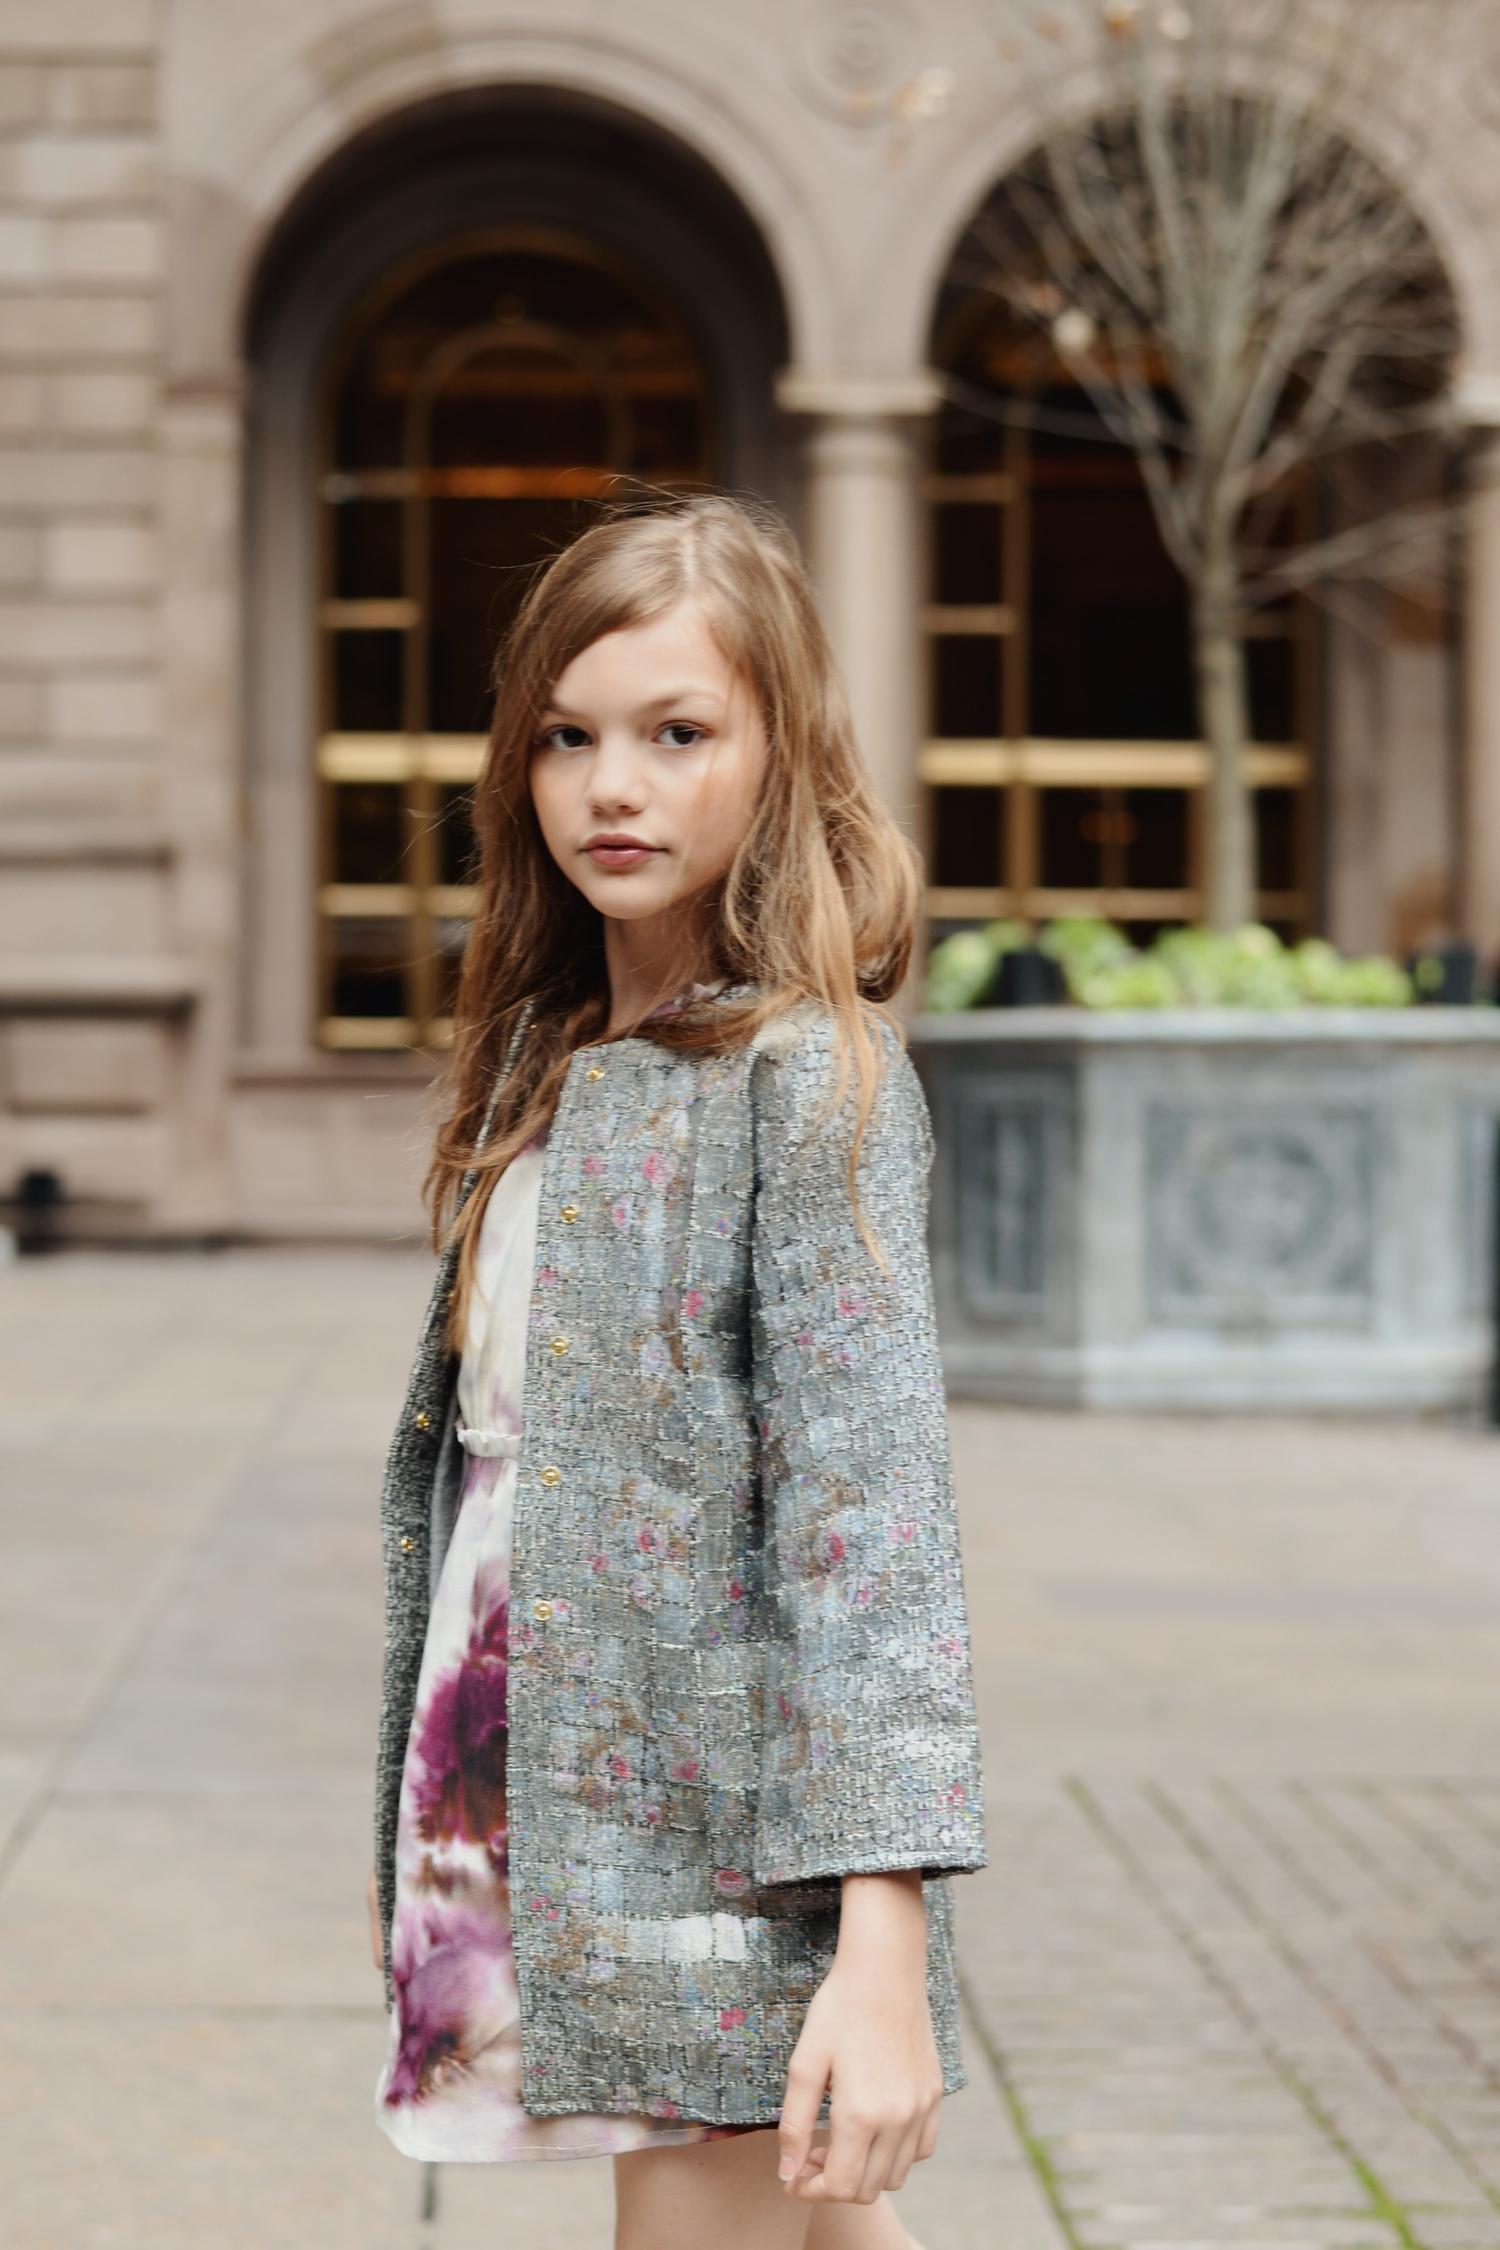 Enfant+Street+Style+by+Gina+Kim+Photography+Lamantine+Paris-1.jpeg